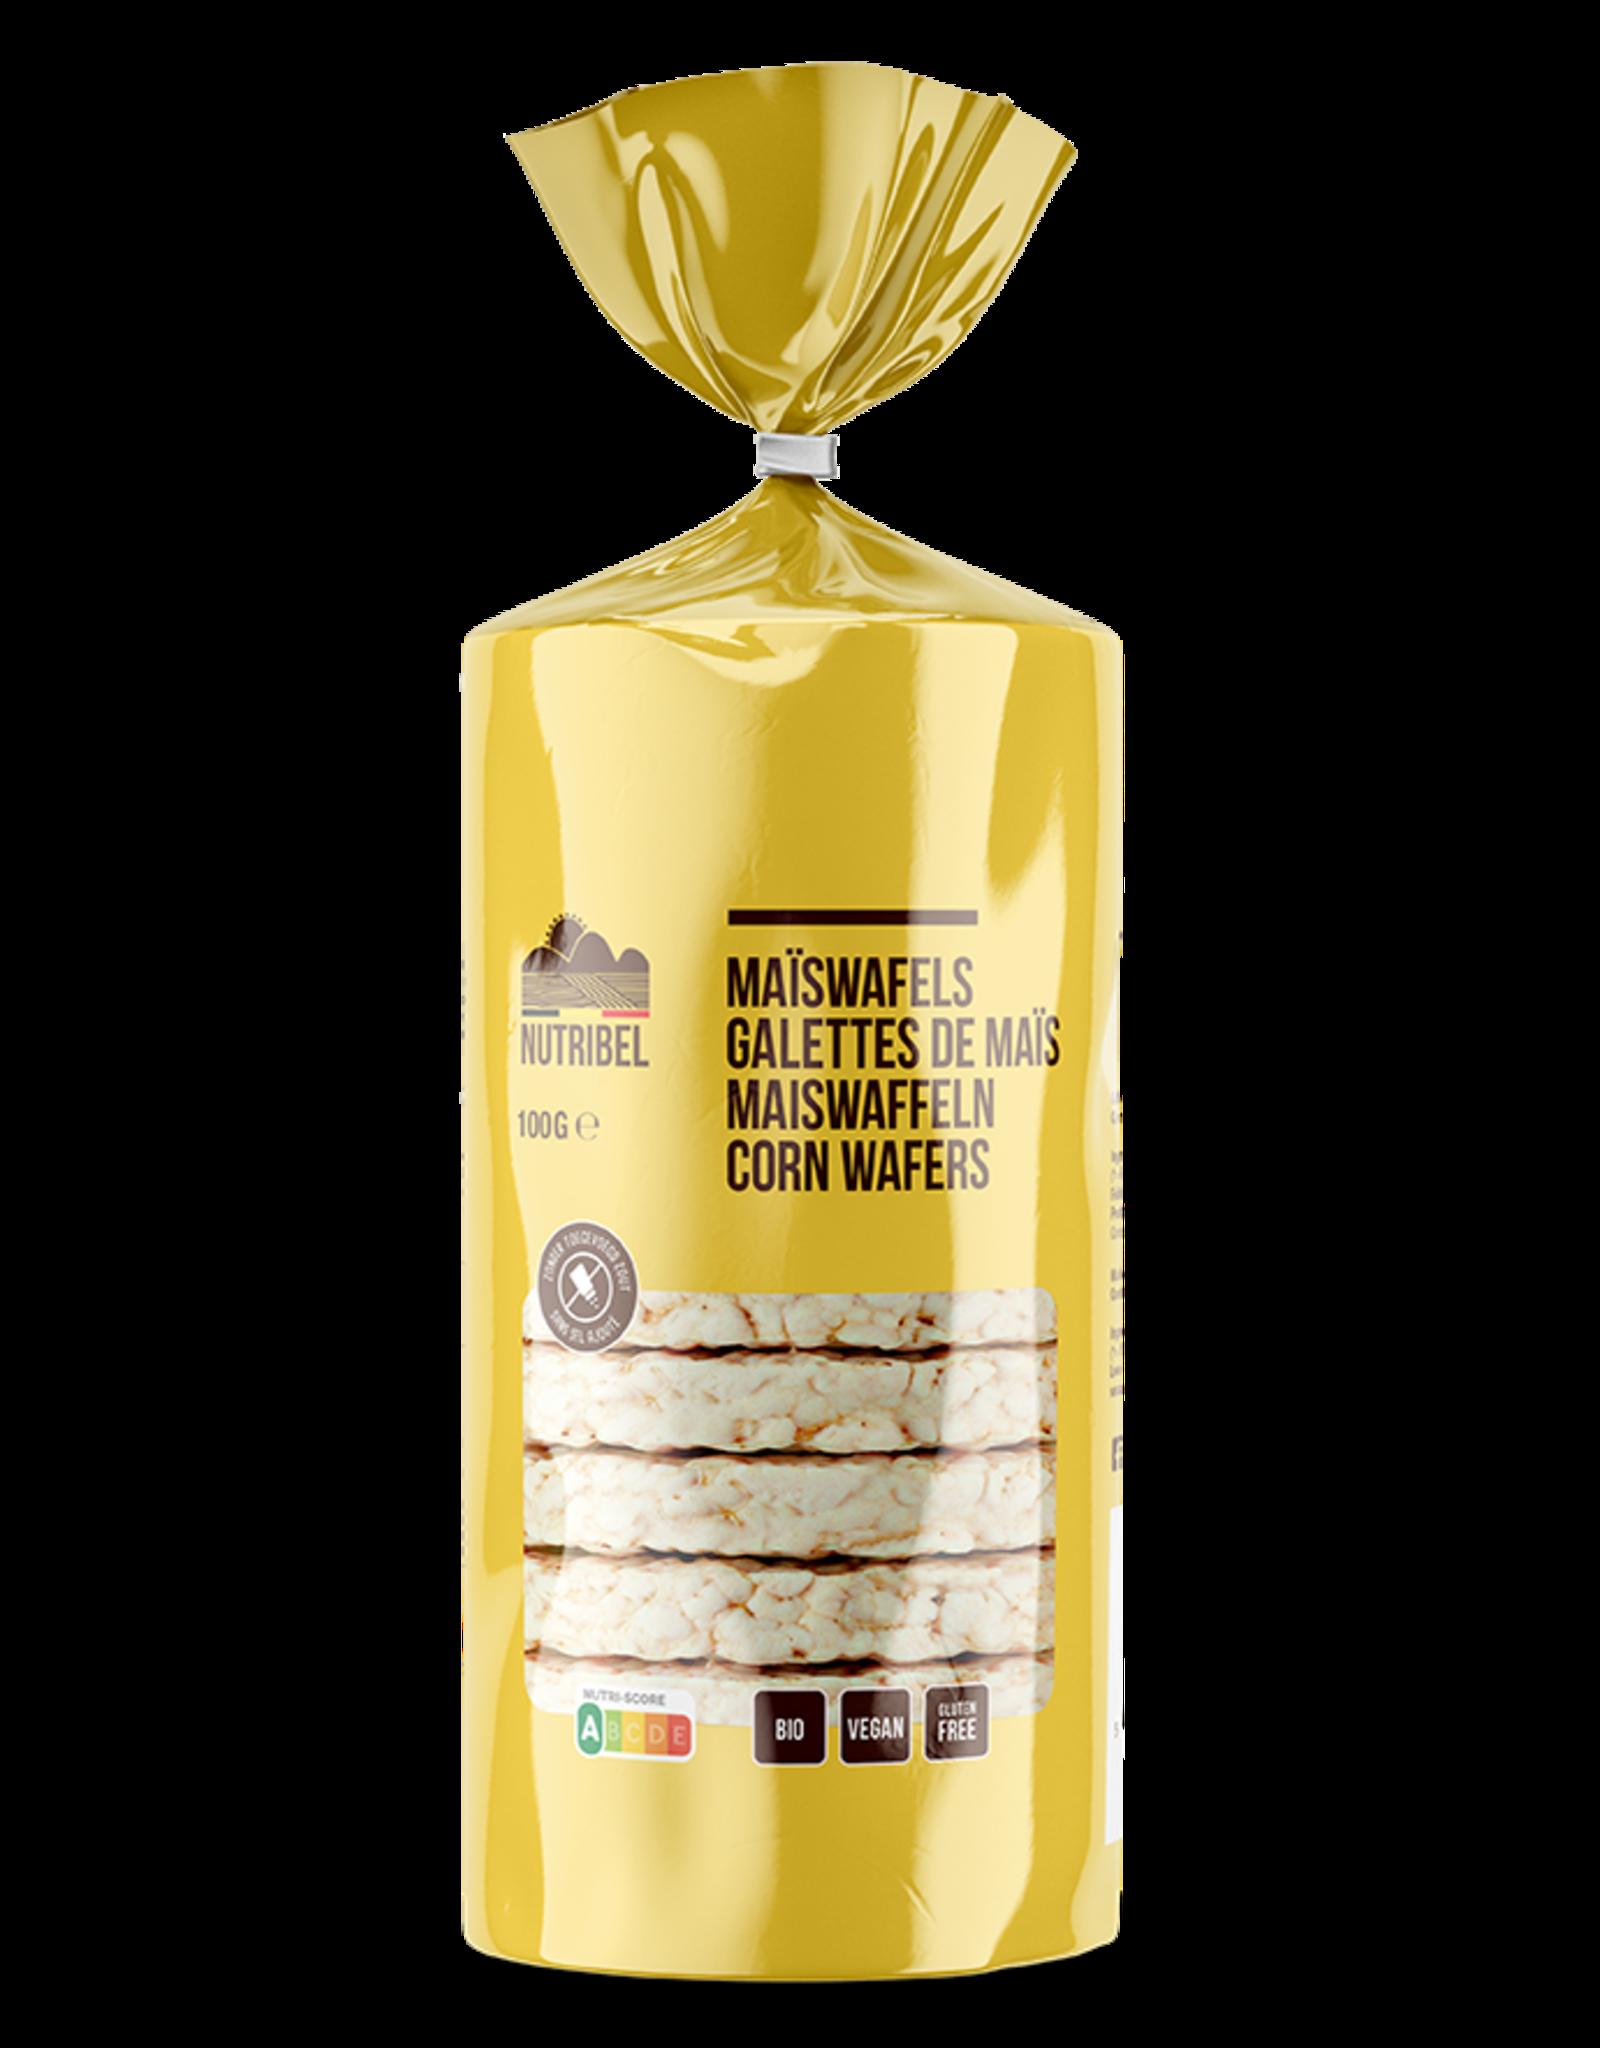 Nutribel Galettes de mais ss bio & sans gluten 100g